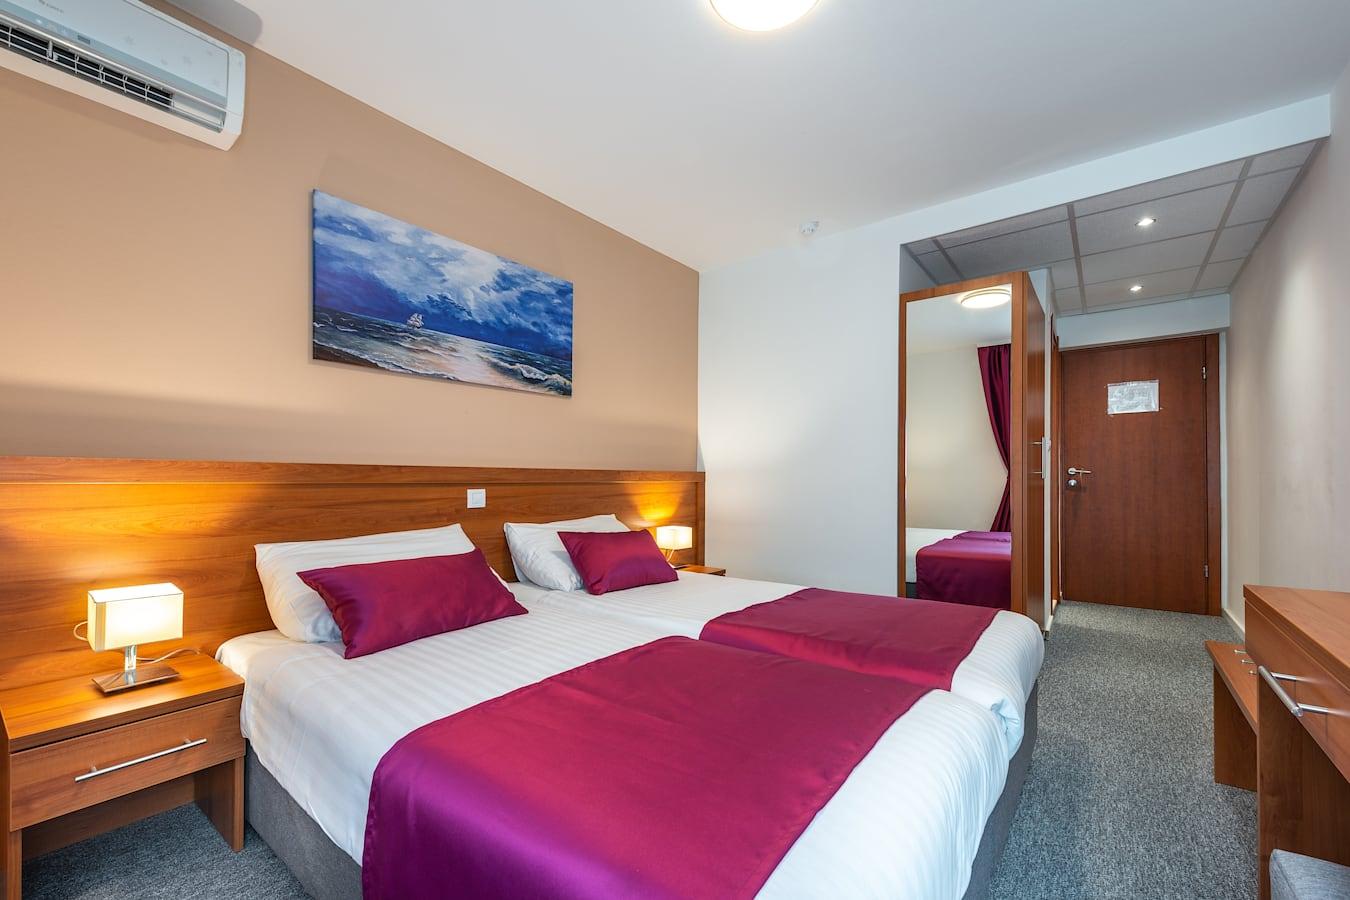 annex-komodor-hotel-double-room-entrance.jpg